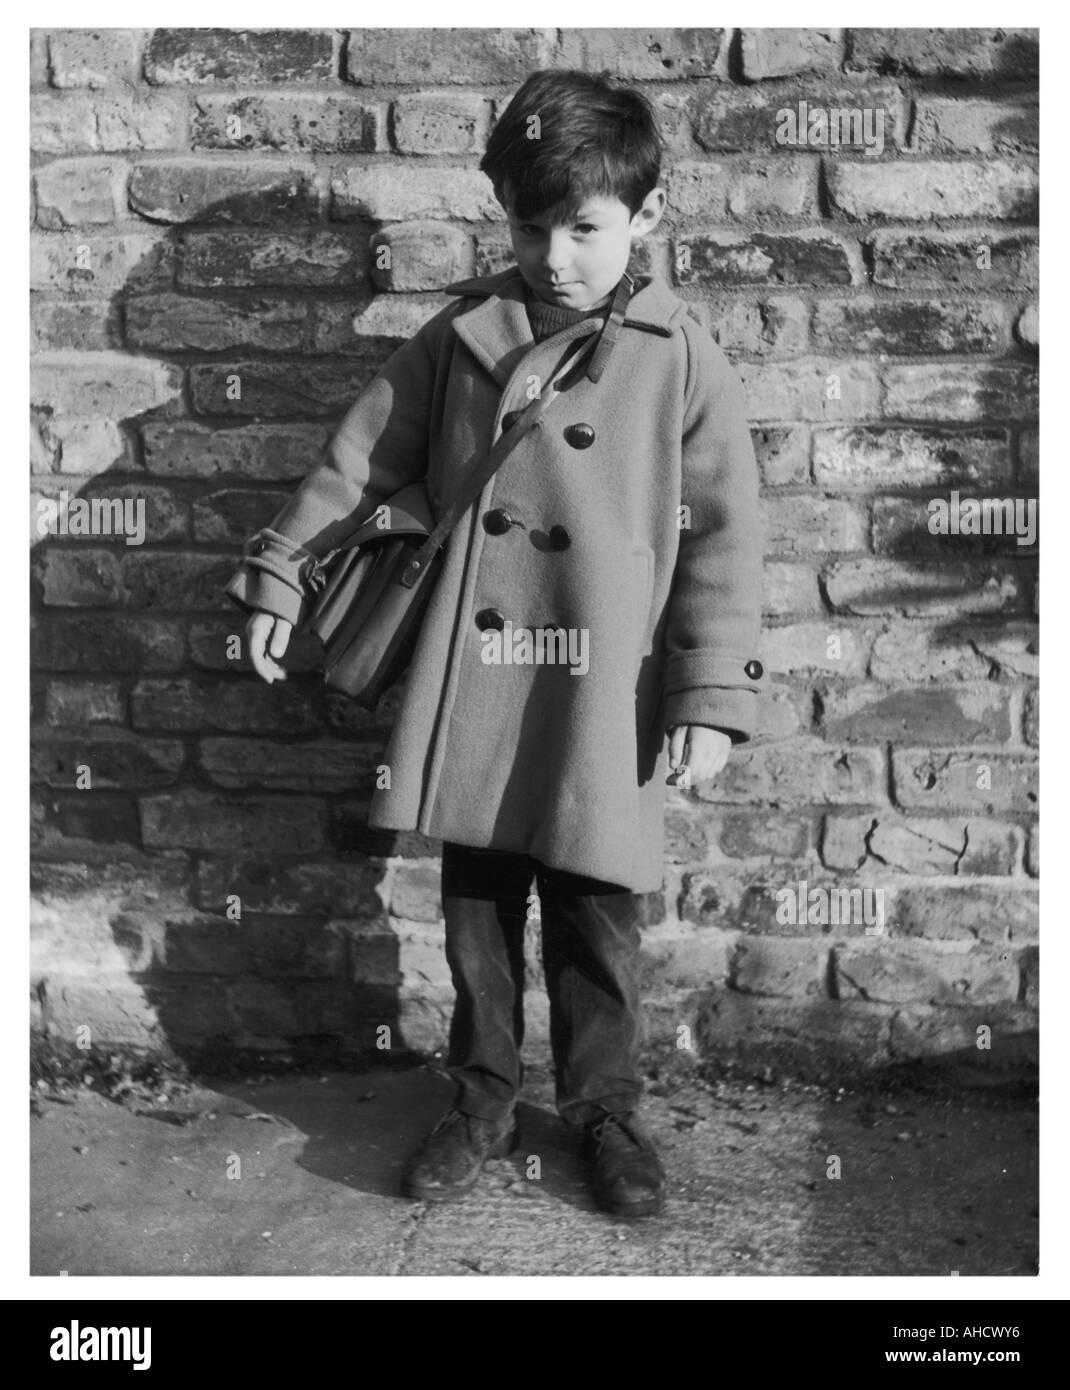 Chico con mochila foto Imagen De Stock